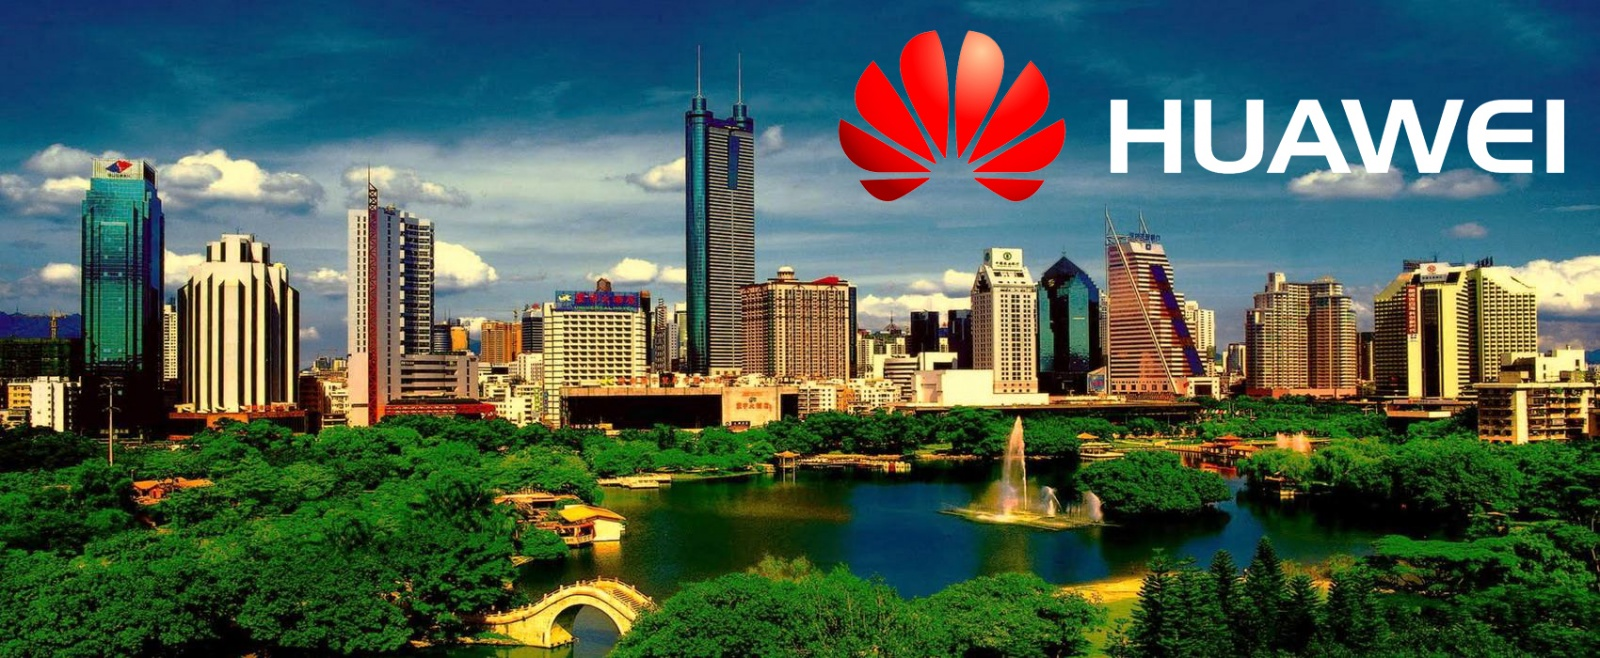 Huawei Technologies. Прекрасное сочетание цена-качество - 1